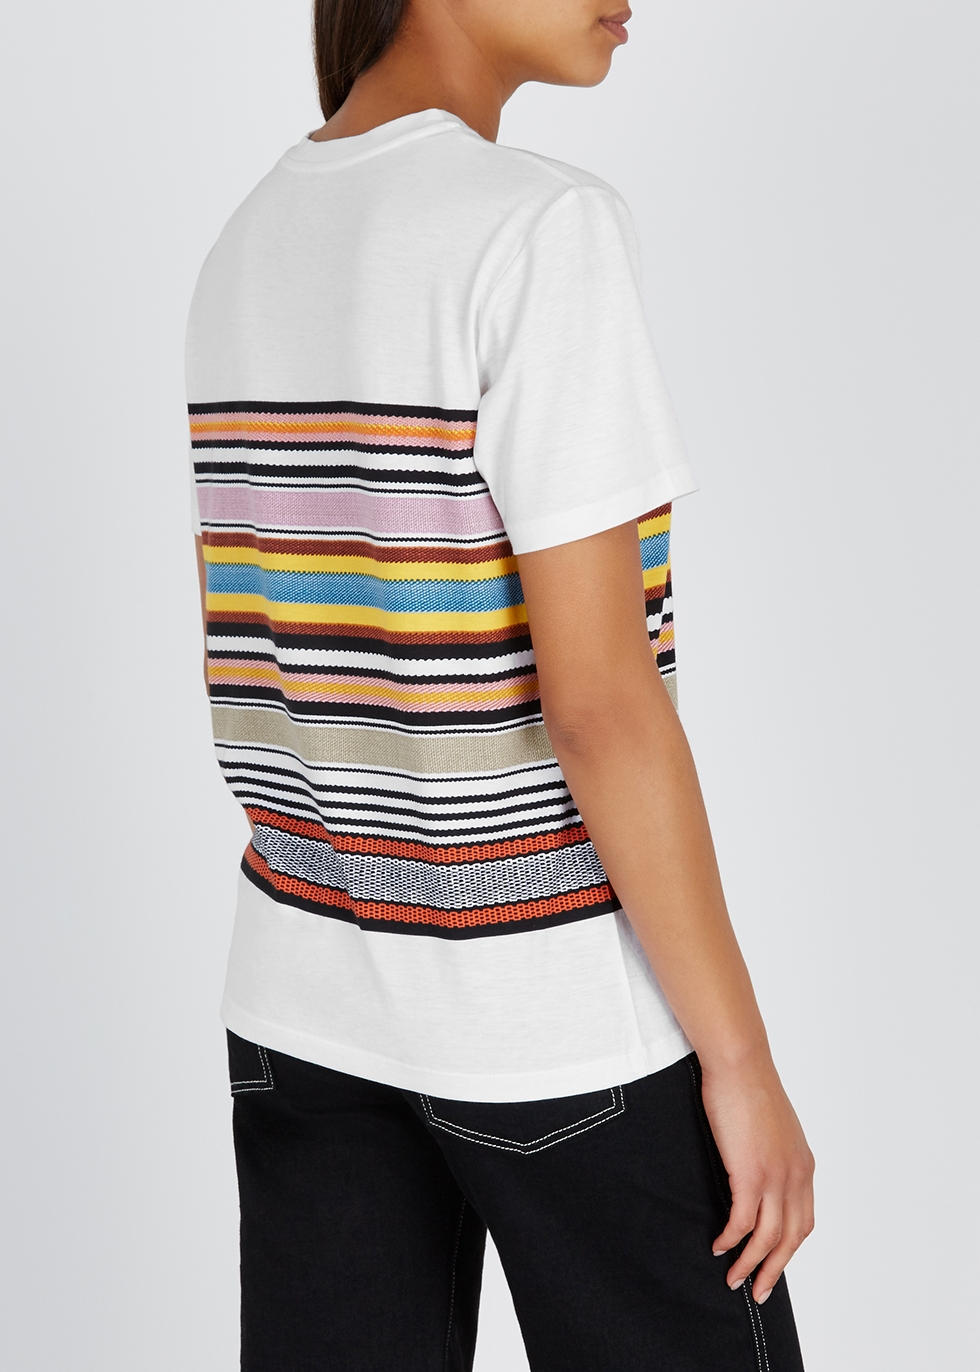 White striped cotton T-shirt - Tory Burch